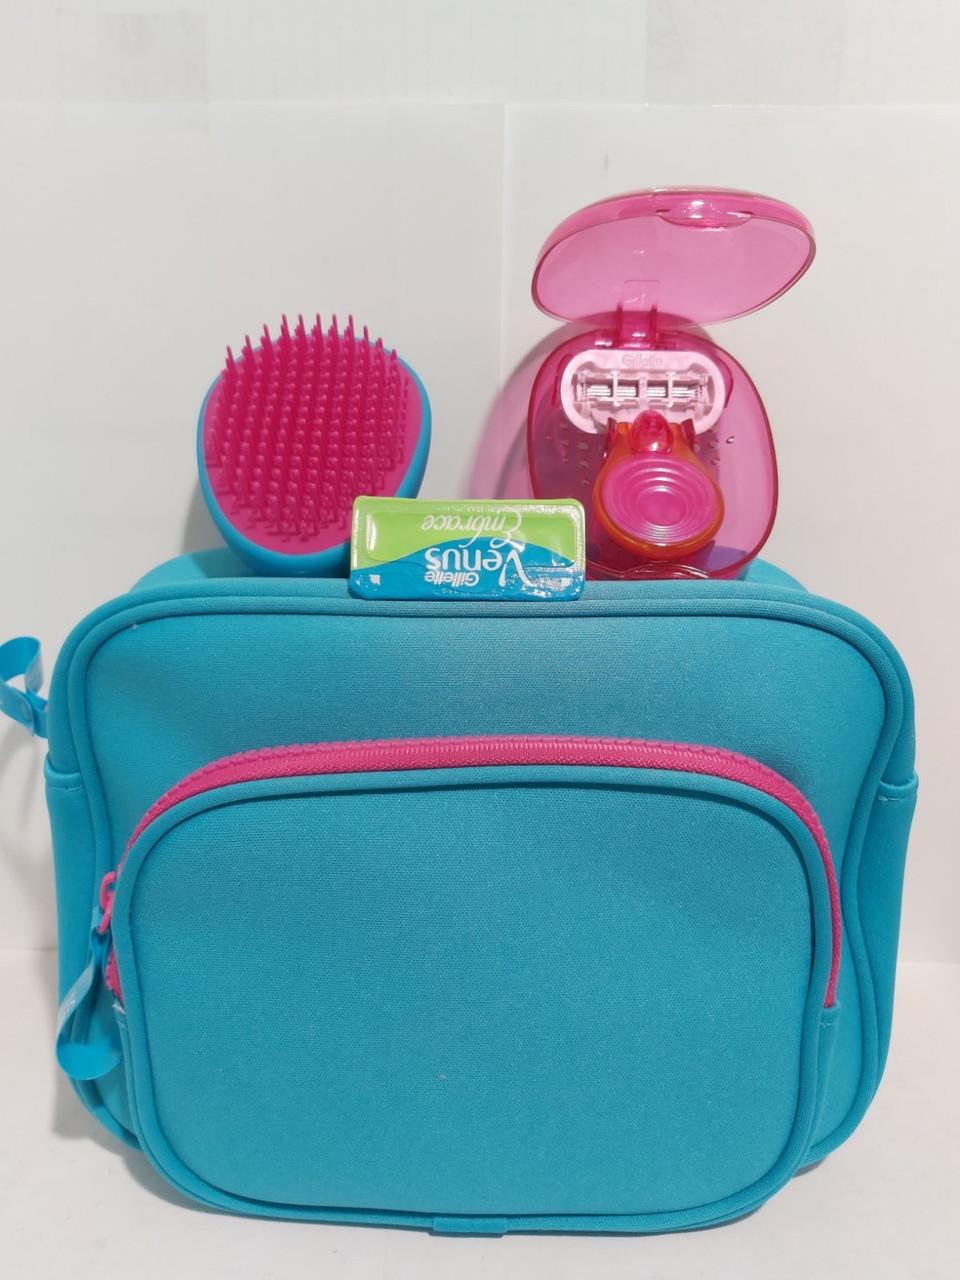 Набор Gillette Venus Snap Embrace,станок+ 2 картриджа+кейс+расческа+сумка